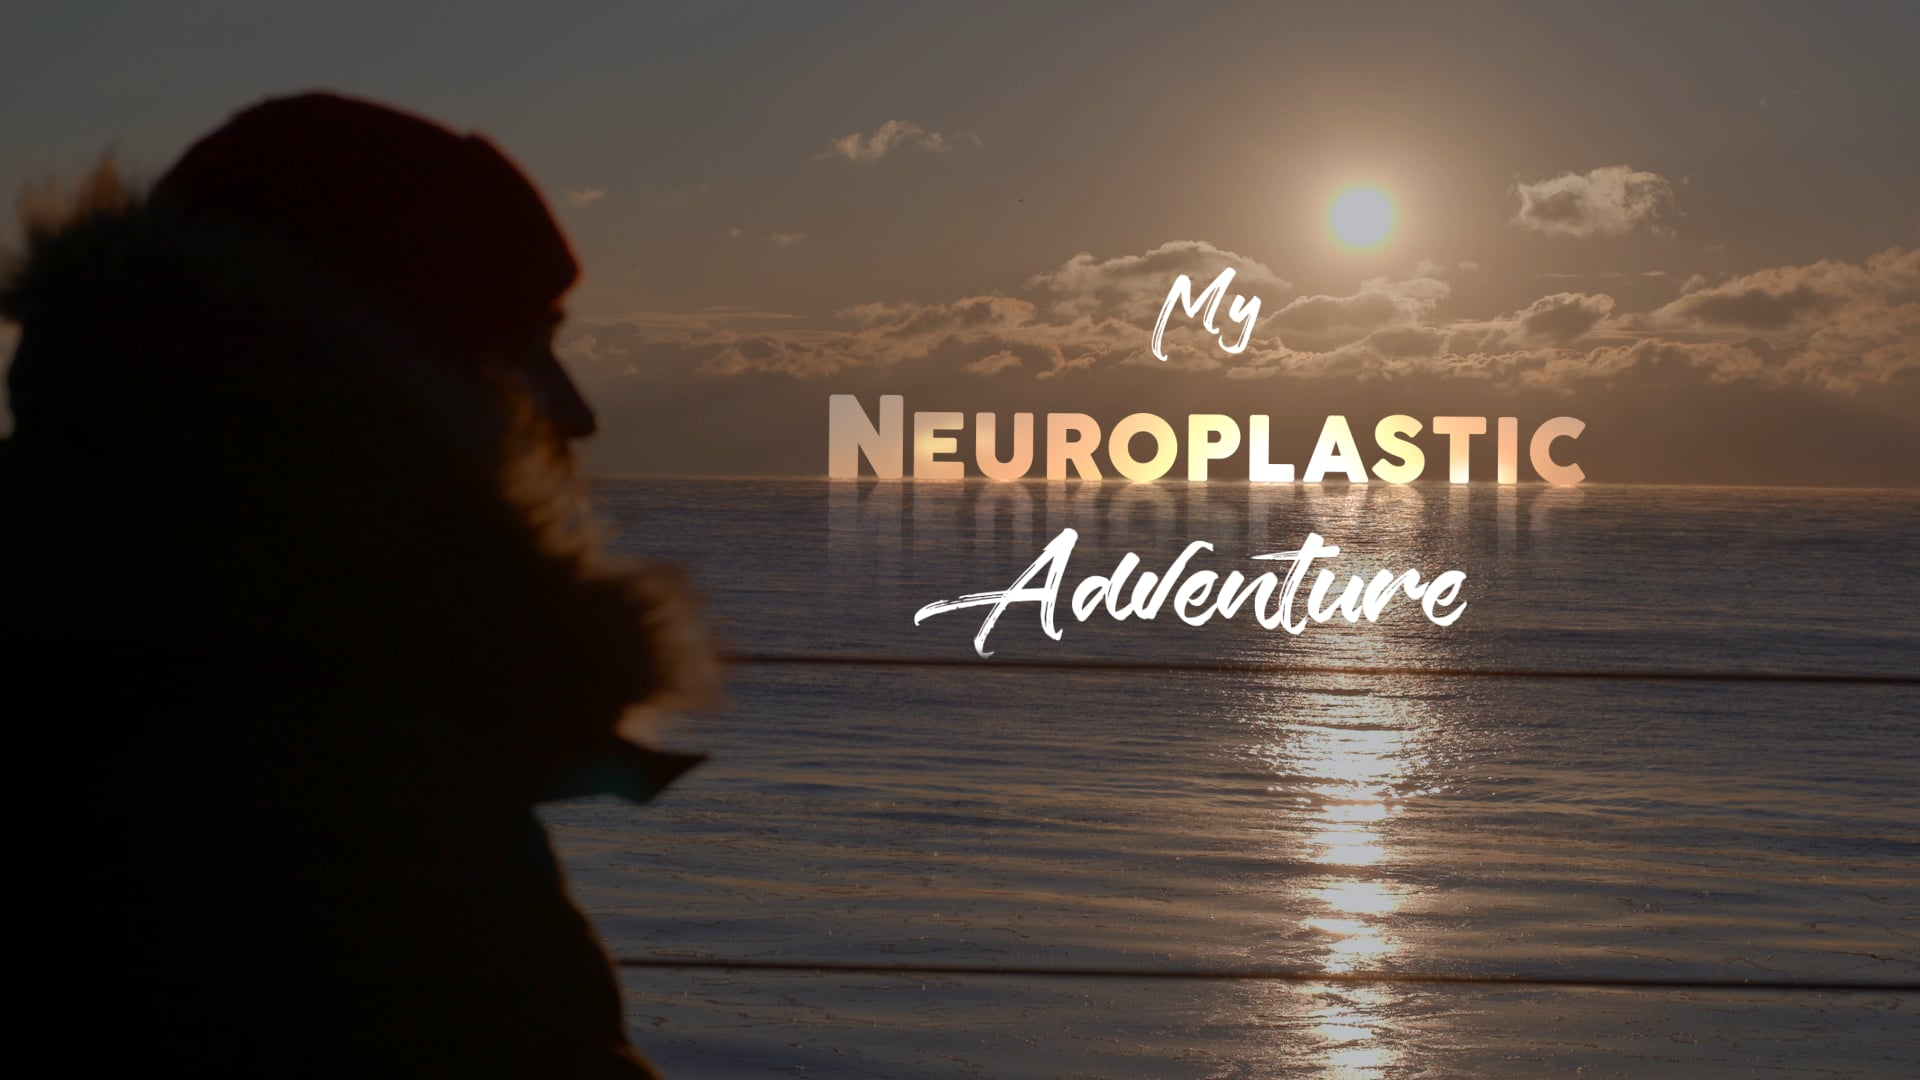 My Neuroplastic Adventure - Teaser